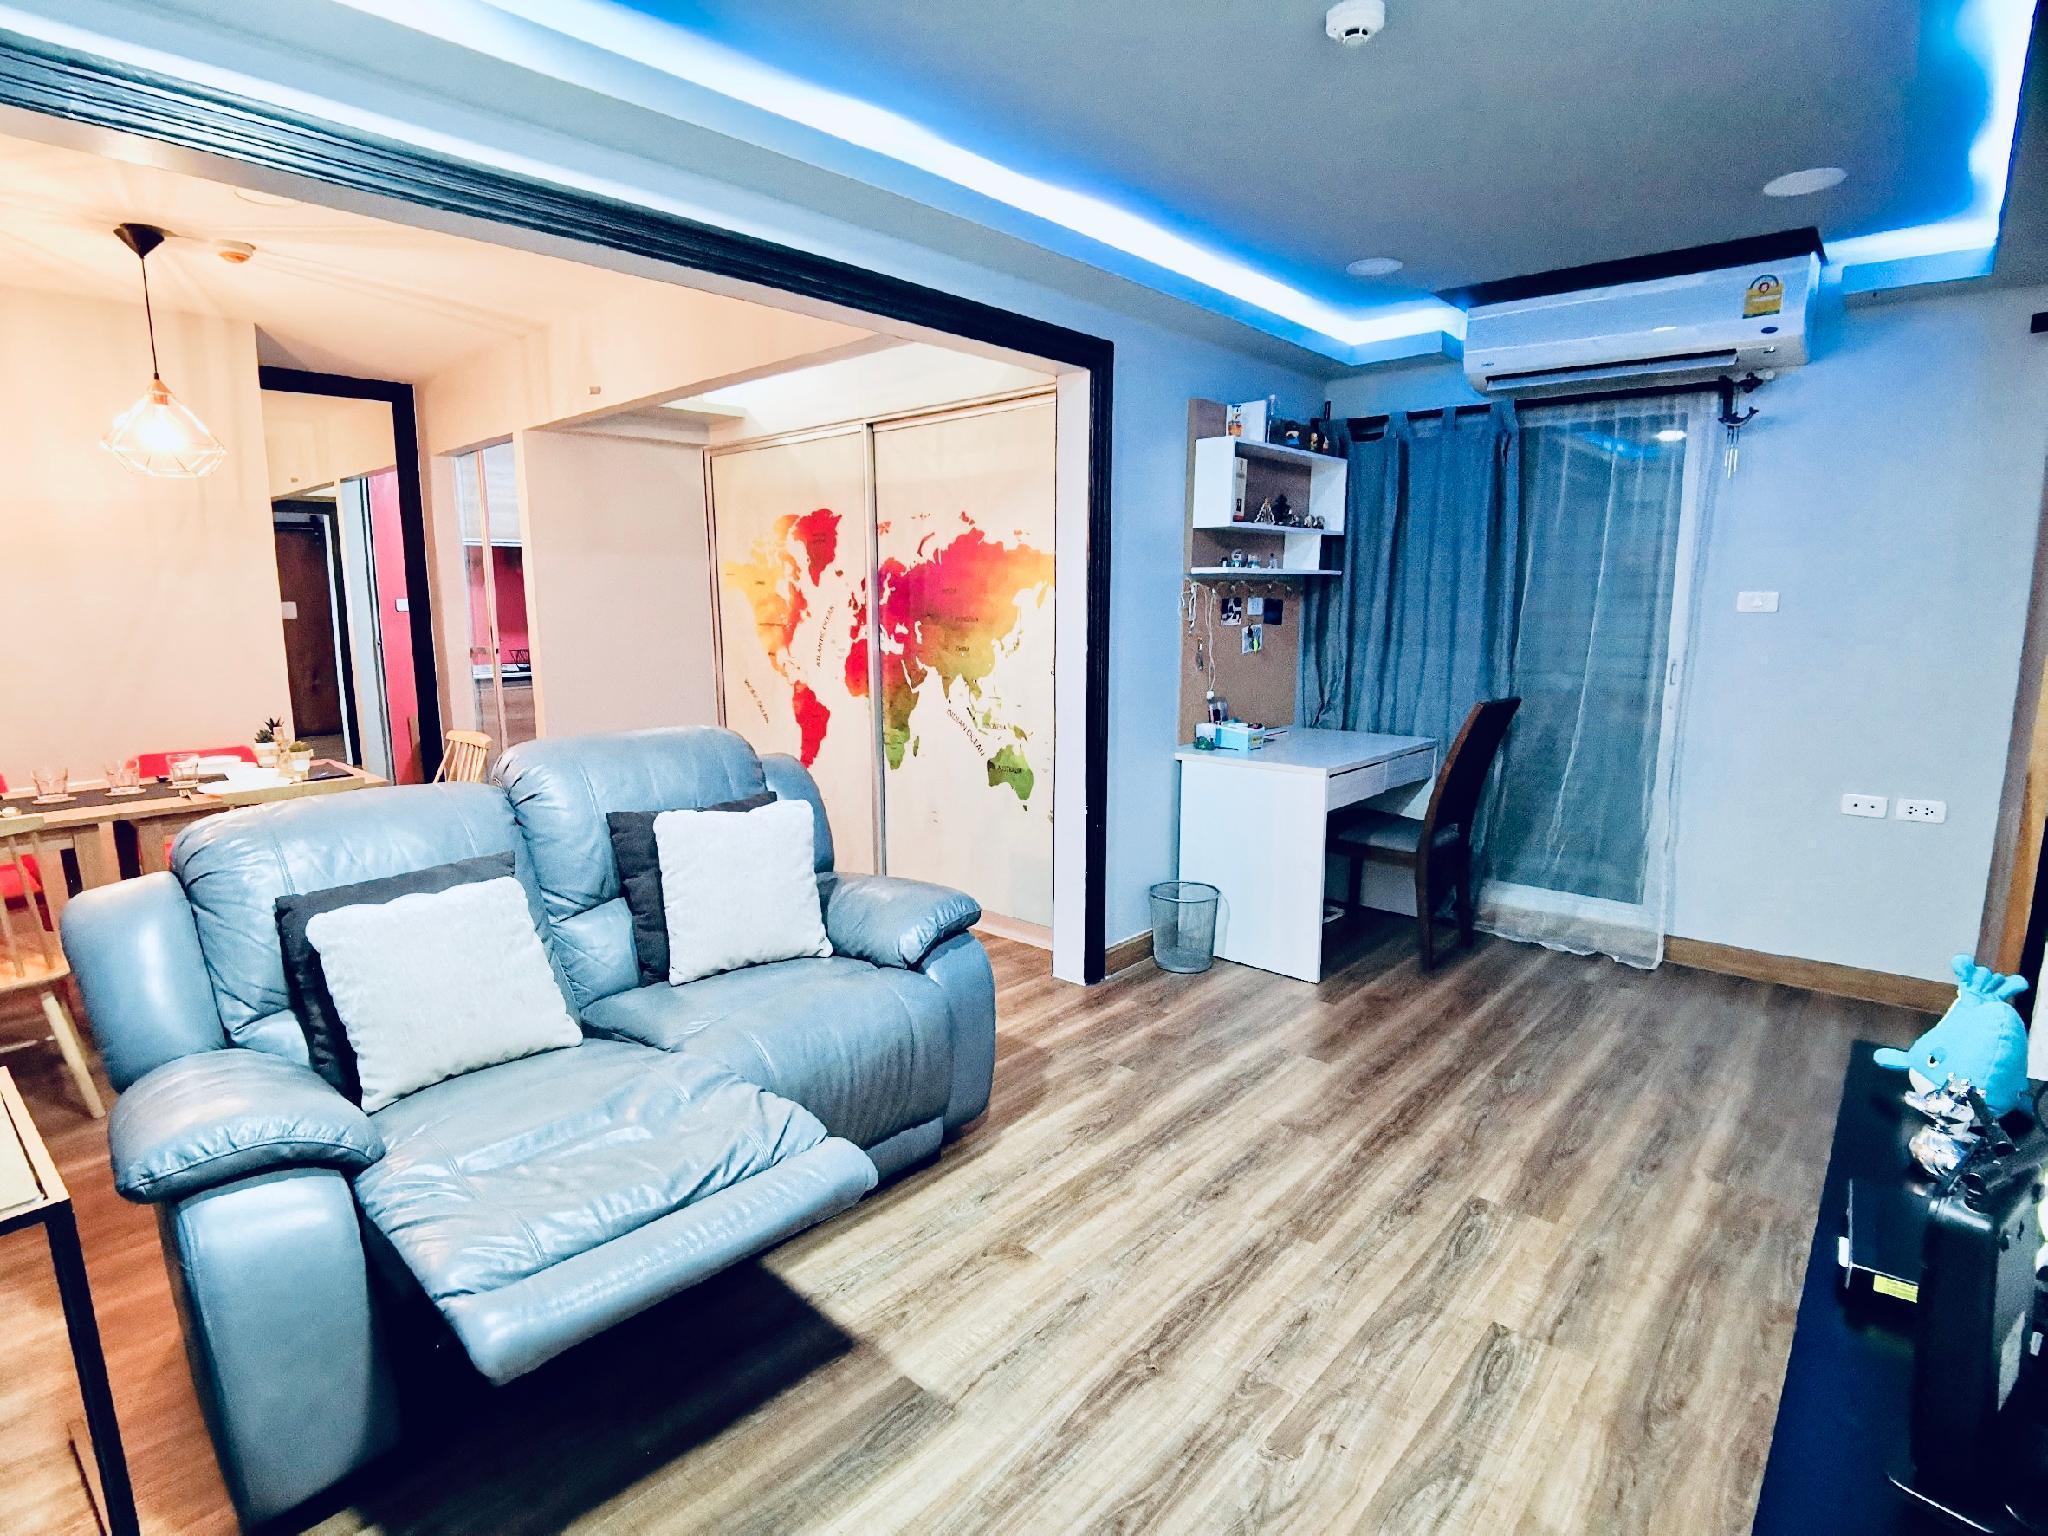 2 Bed rm, 2 Baht rm, cozy Condo in the city center อพาร์ตเมนต์ 2 ห้องนอน 2 ห้องน้ำส่วนตัว ขนาด 50 ตร.ม. – ธนบุรี